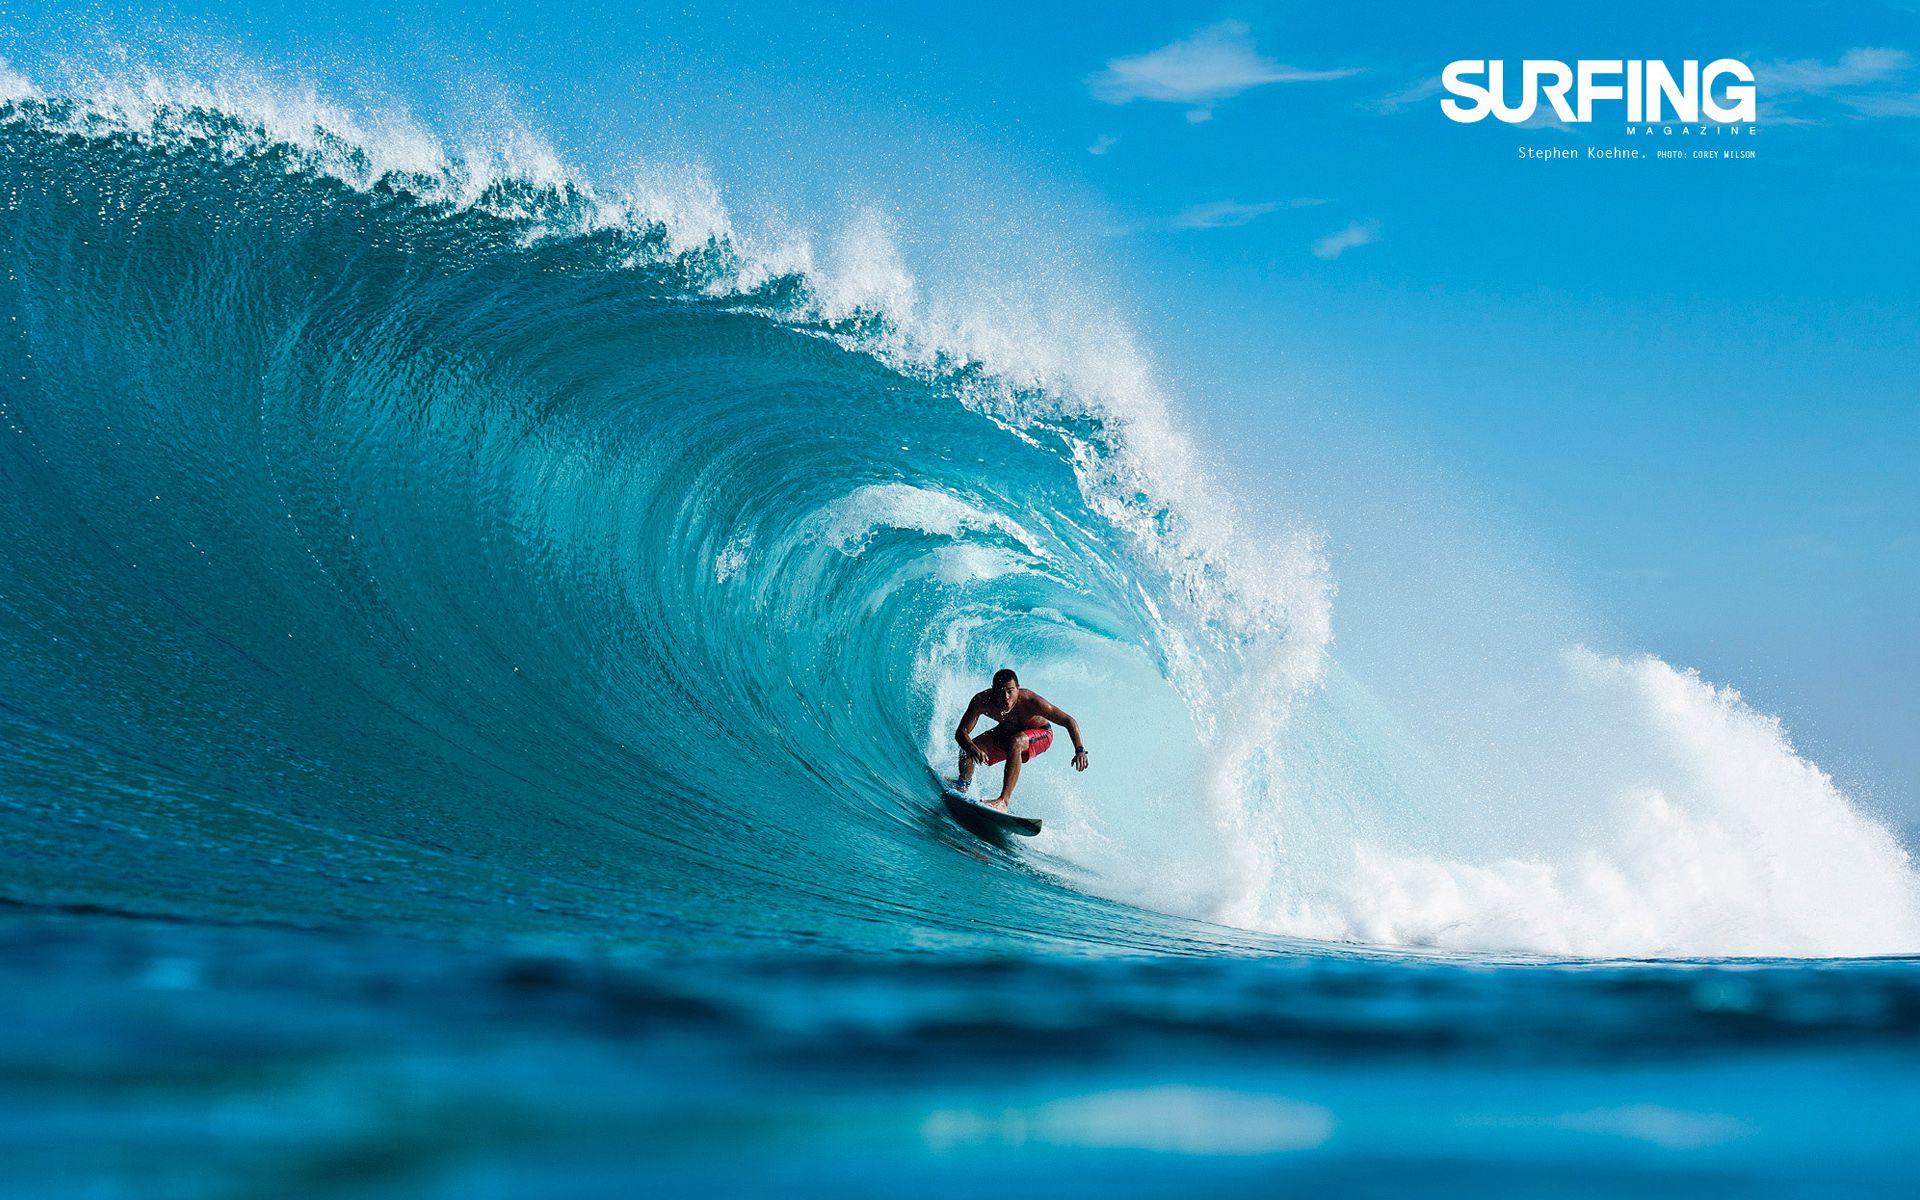 surfer free ocean wallpapers blirknet 58d94a383df78c516203cde5